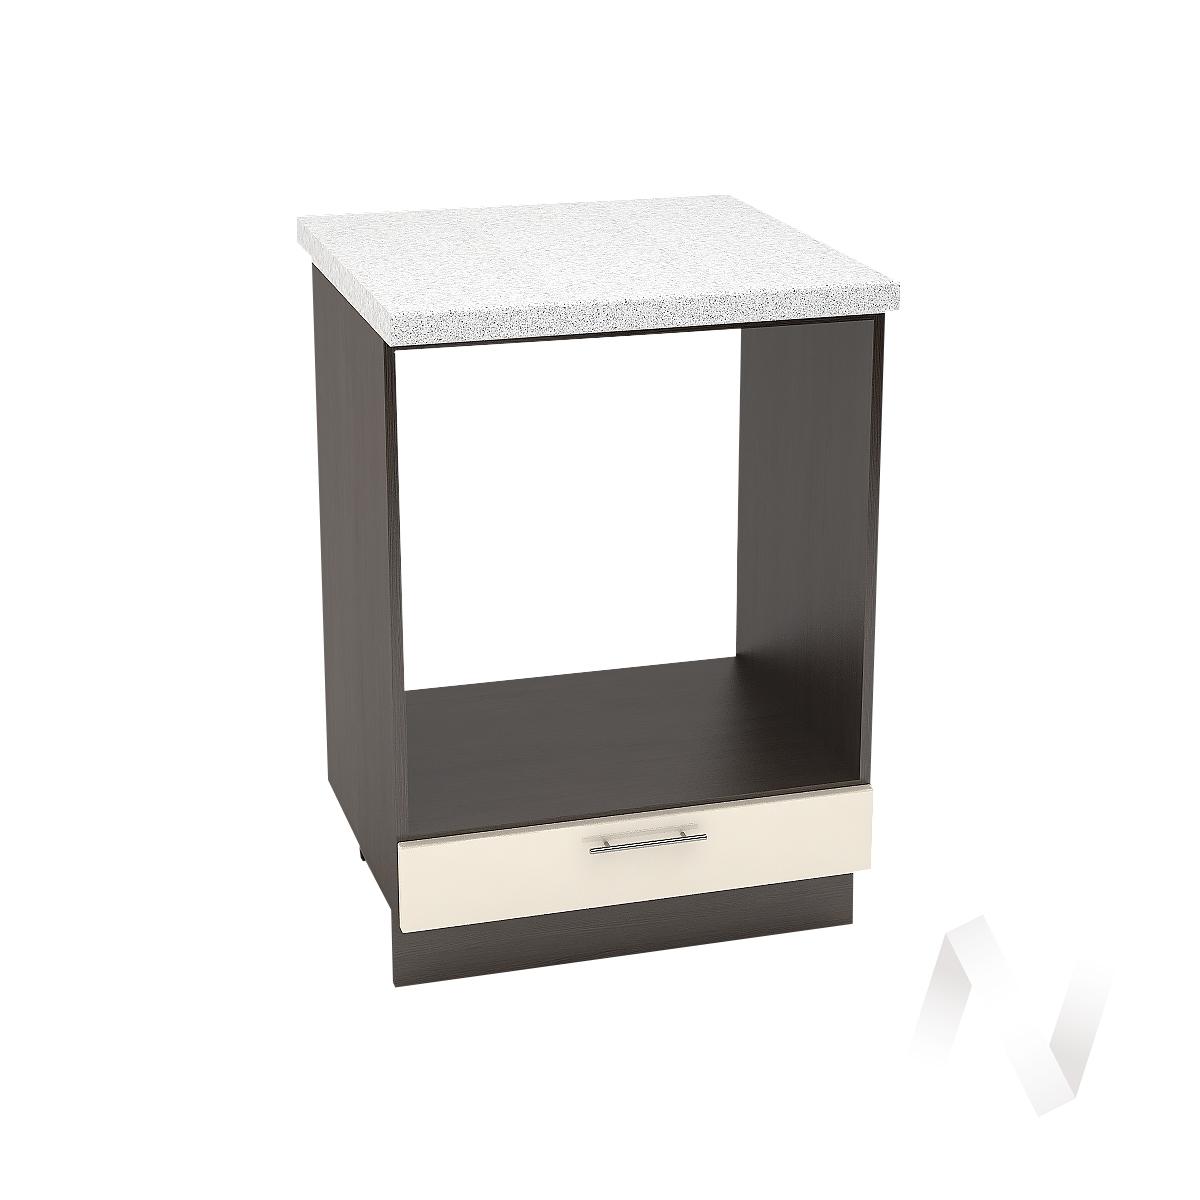 "Кухня ""Валерия-М"": Шкаф нижний под духовку 600, ШНД 600 (Ваниль глянец/корпус венге)"